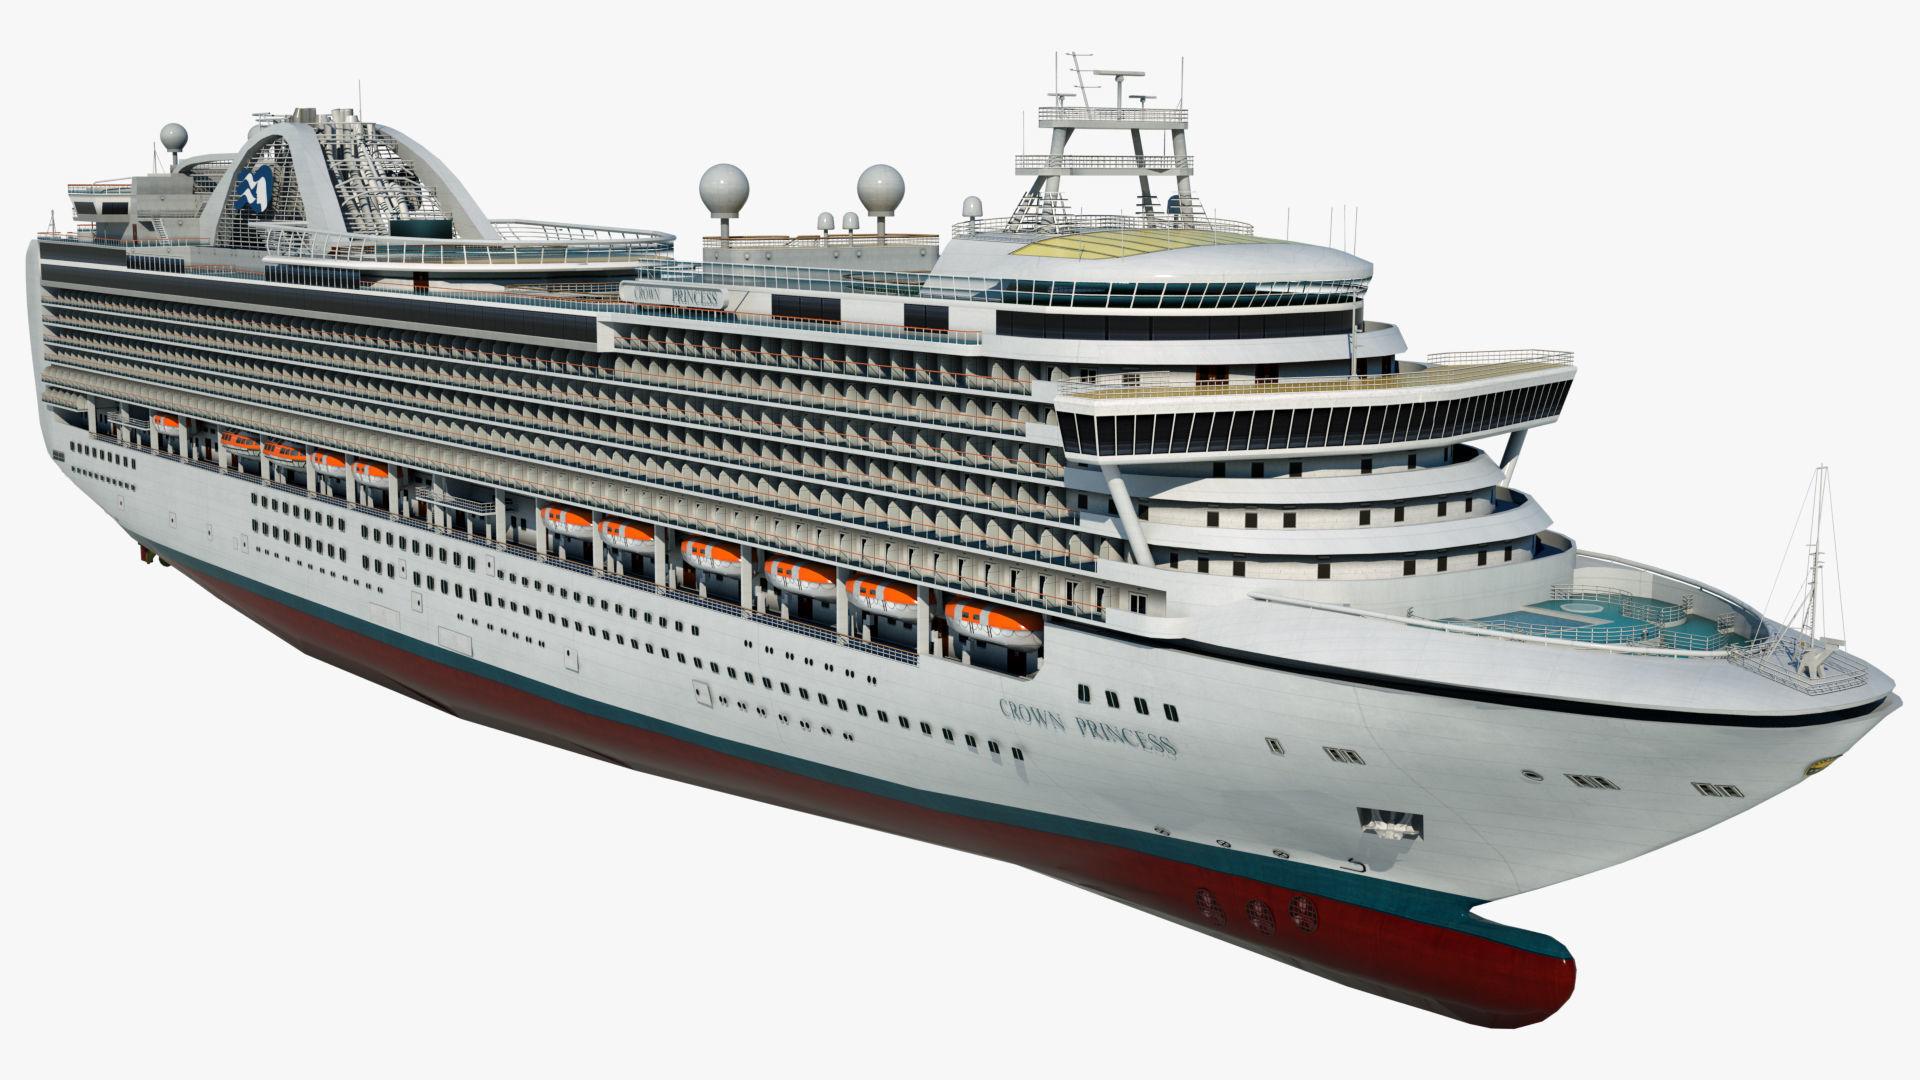 Cruise Ship Crown Princess